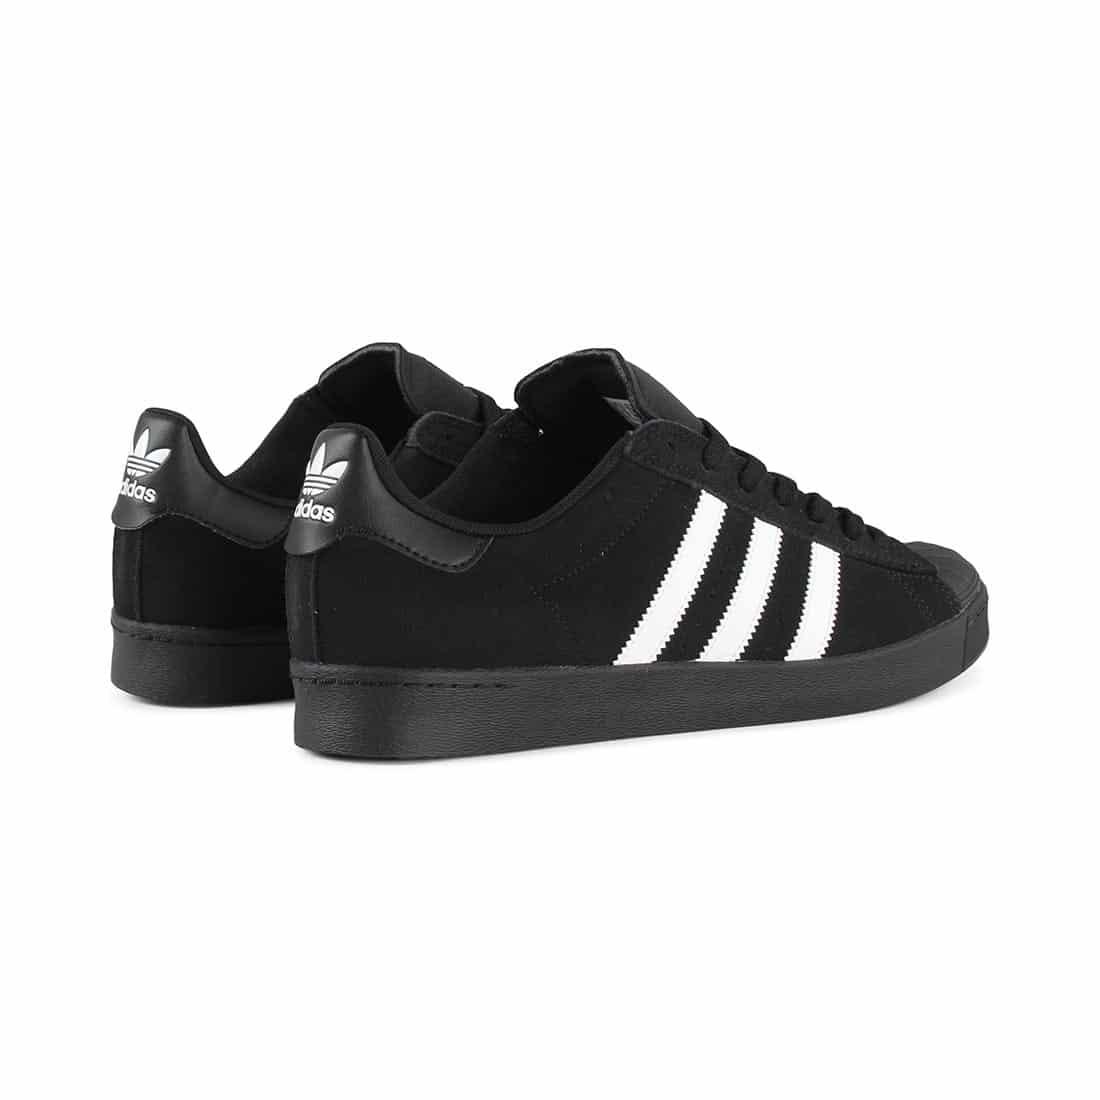 quality design ed714 499b3 Adidas-Superstar-Vulc-ADV-Shoes-Core-Black-White-